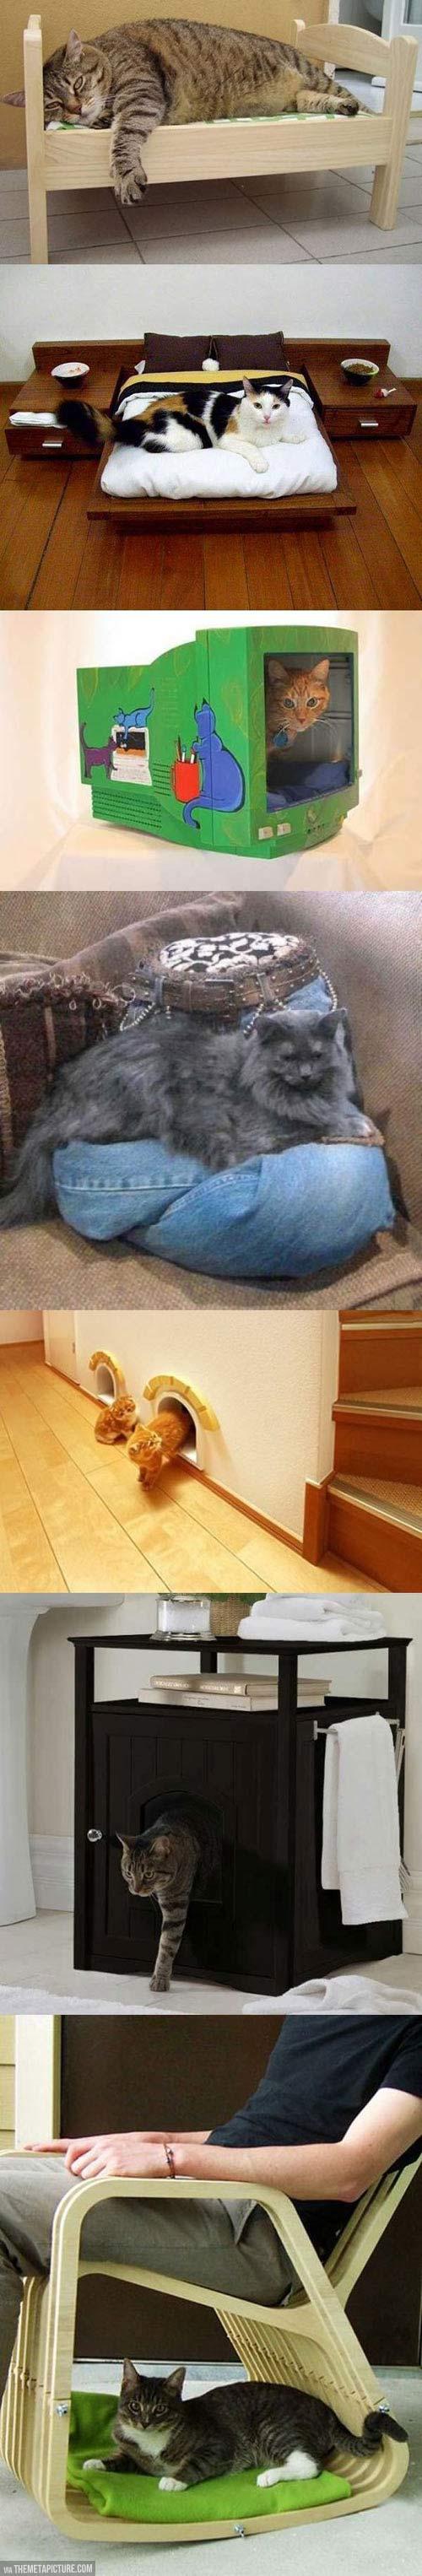 funny-cat-little-furniture